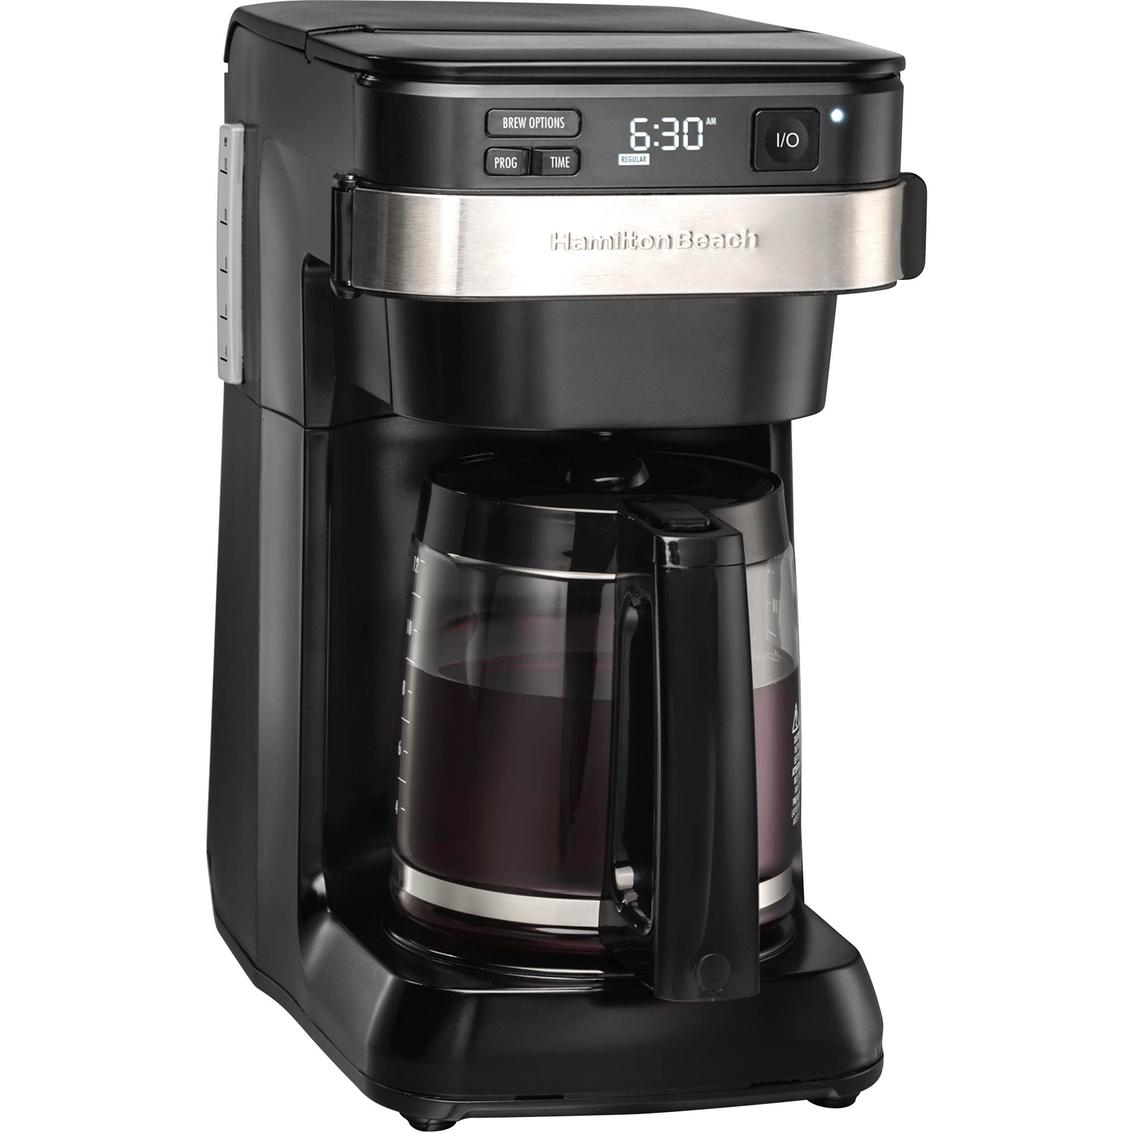 Best Drip Coffee Maker Programmable : Hamilton Beach Programmable Easy Access Coffee Maker Drip Coffeemakers Home & Appliances ...